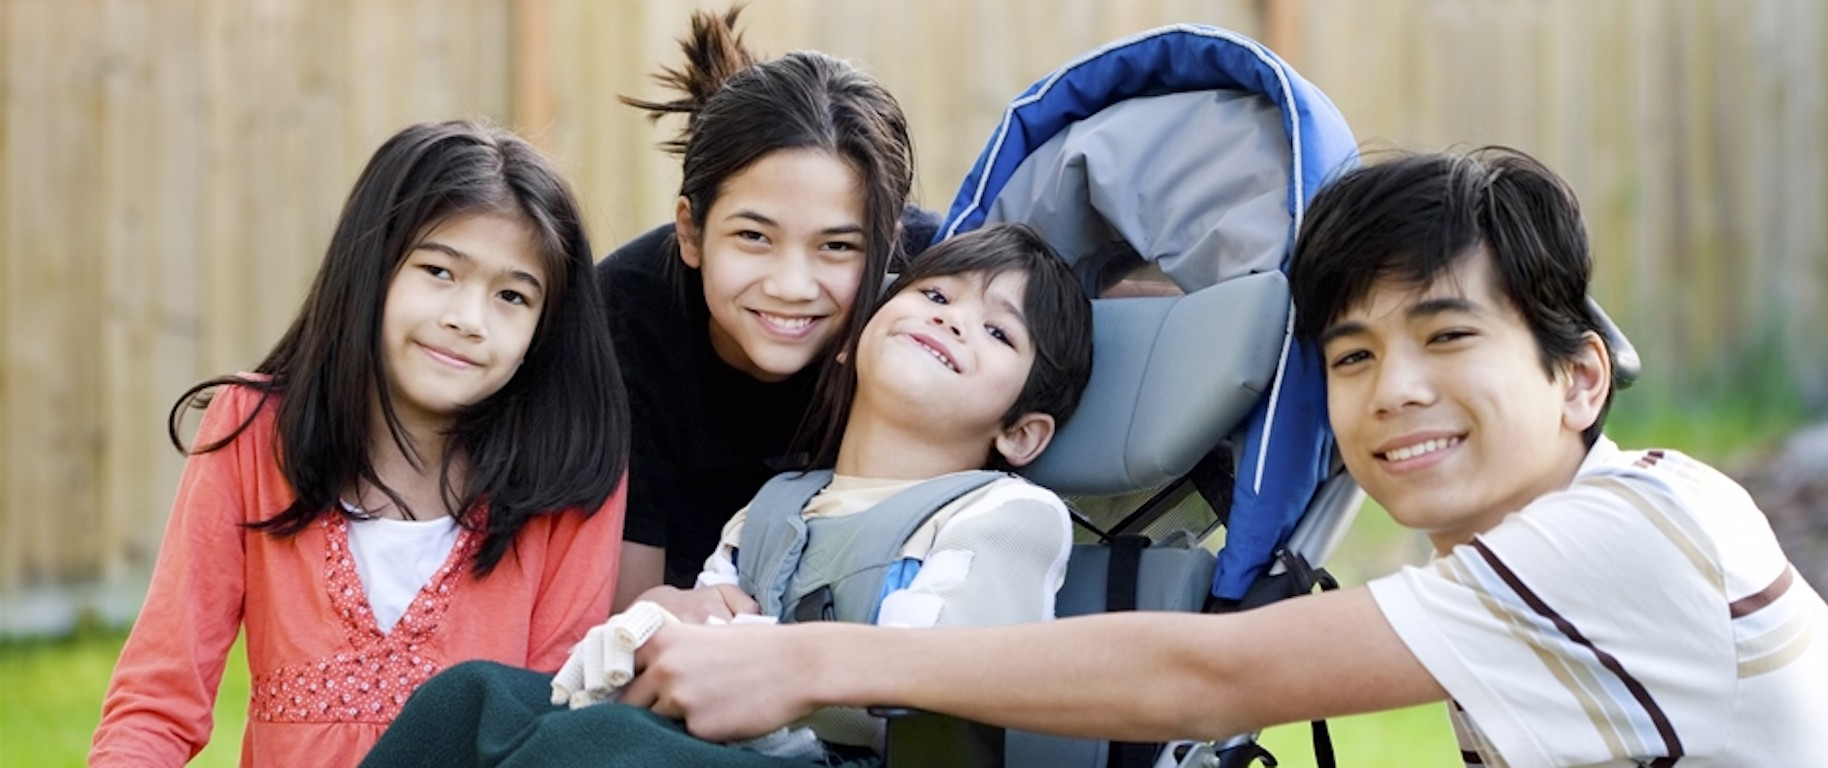 Care Options for Kids | LinkedIn